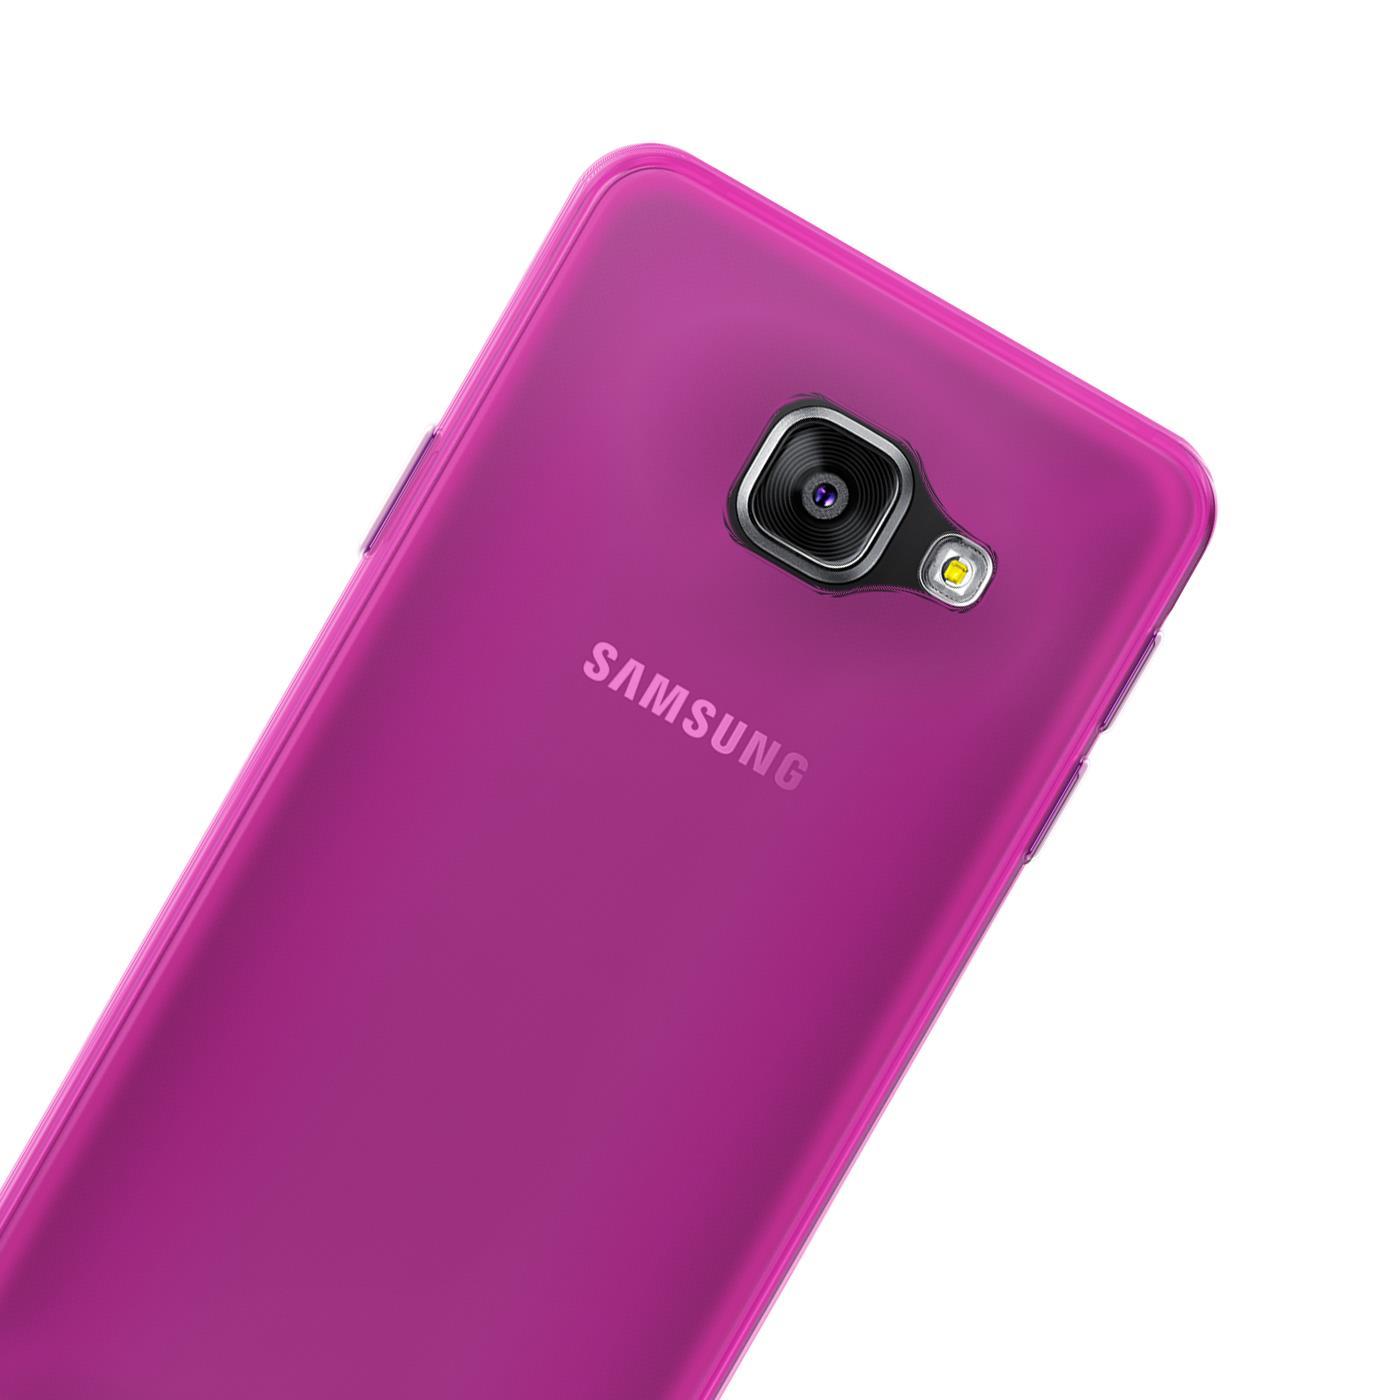 Samsung-Galaxy-a3-2016-Thin-Silikon-Klar-Case-Cover-Ultra-Slim-Stossfeste-Gel Indexbild 26